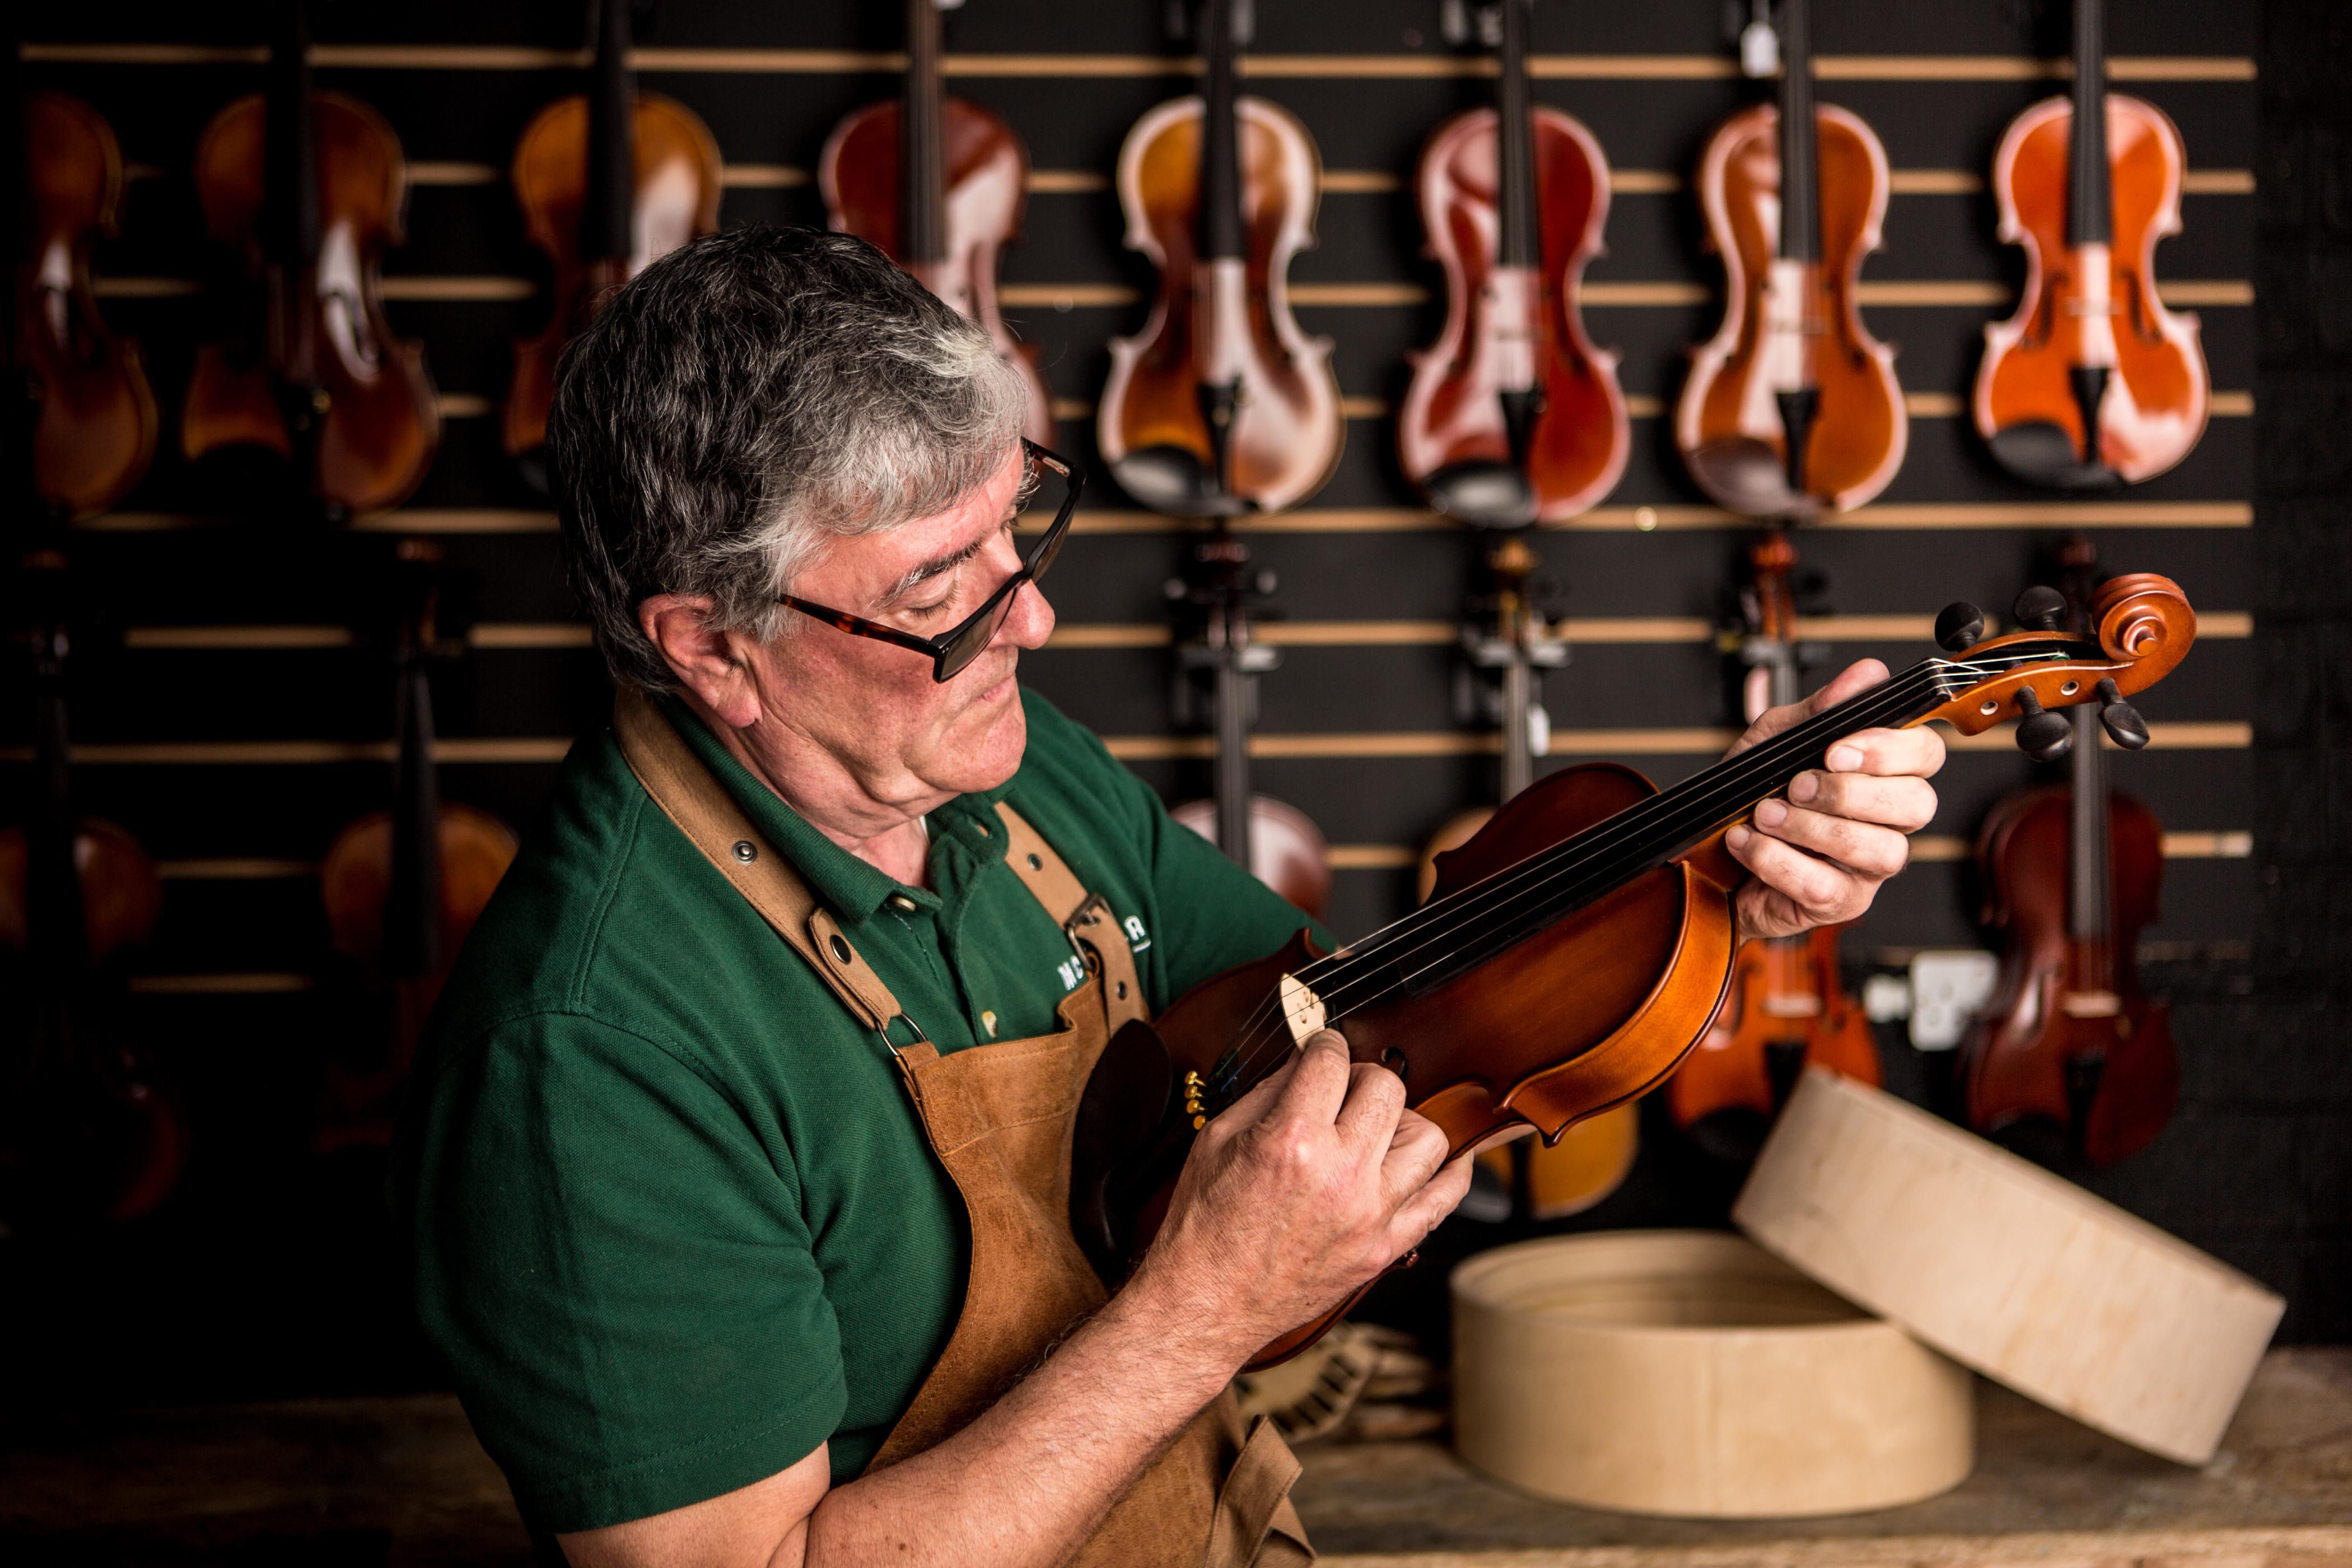 paraic-mcneela-instuments-workshop-irish-fiddle.jpg